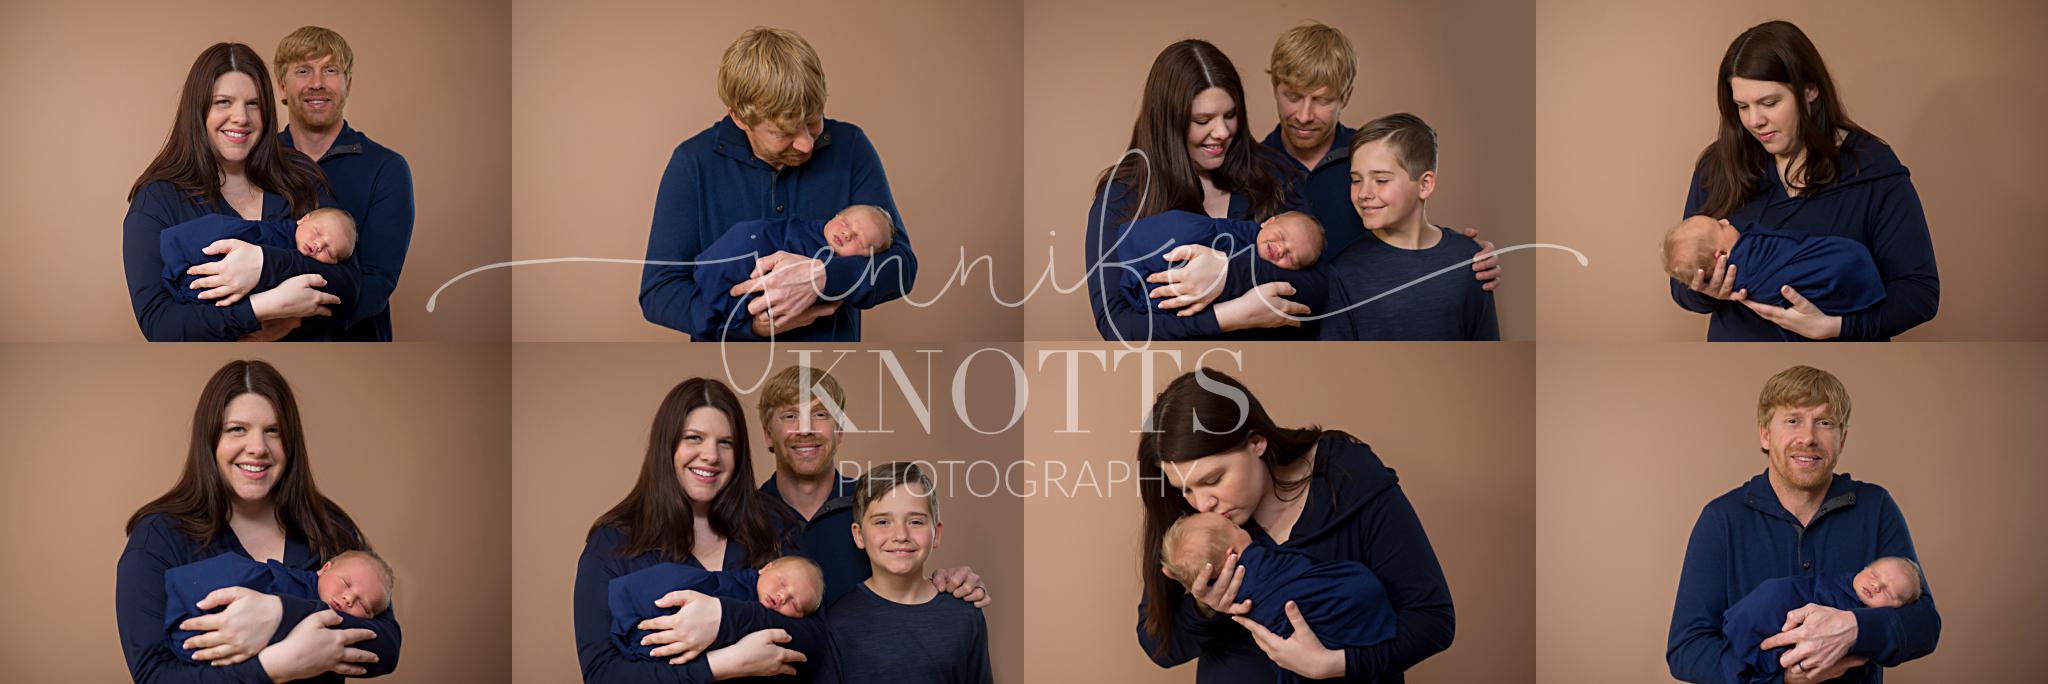 wilmington newborn session